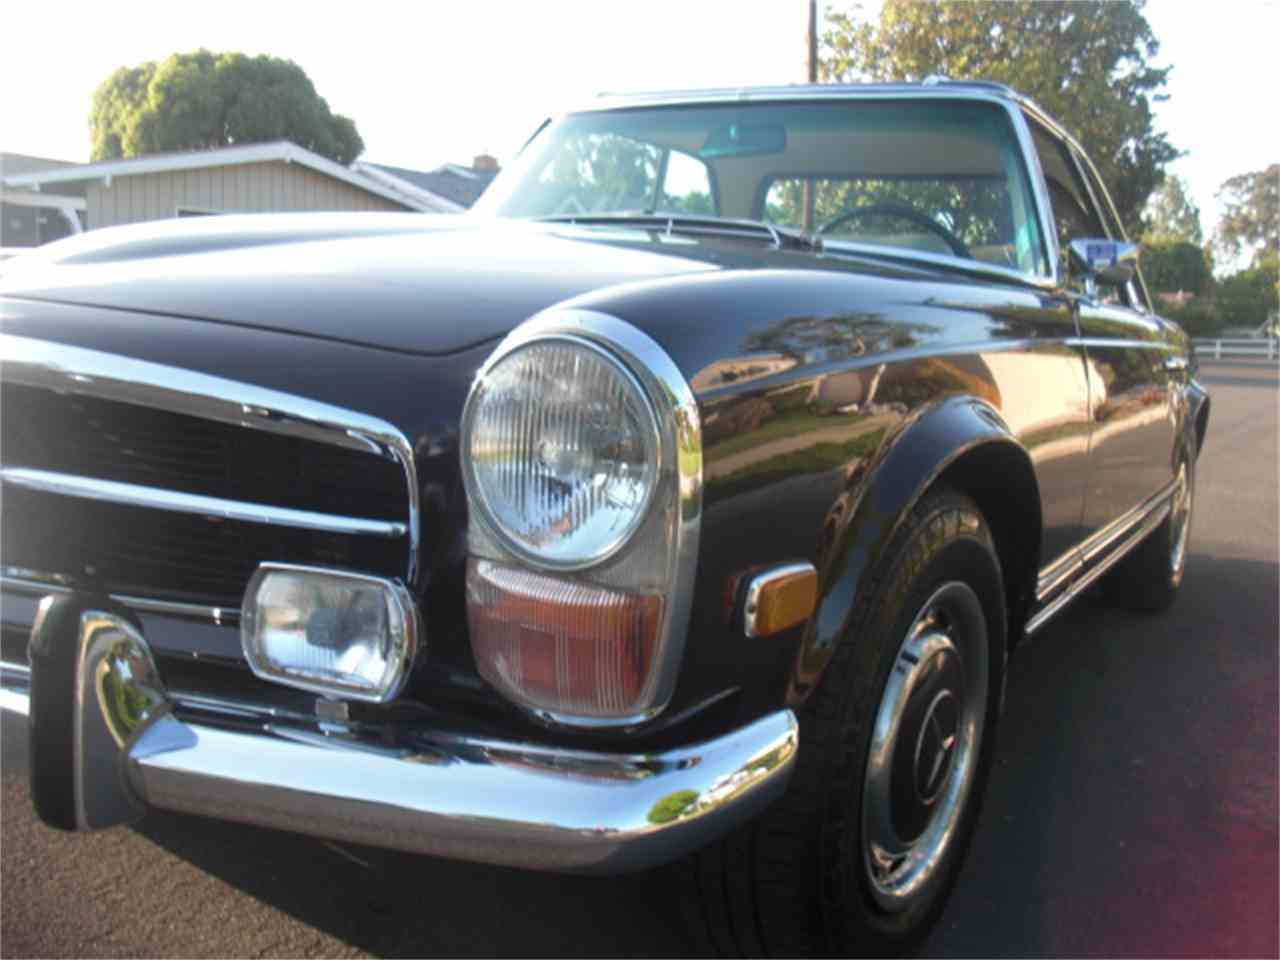 1971 mercedes benz 280sl for sale cc for Mercedes benz sherman oaks